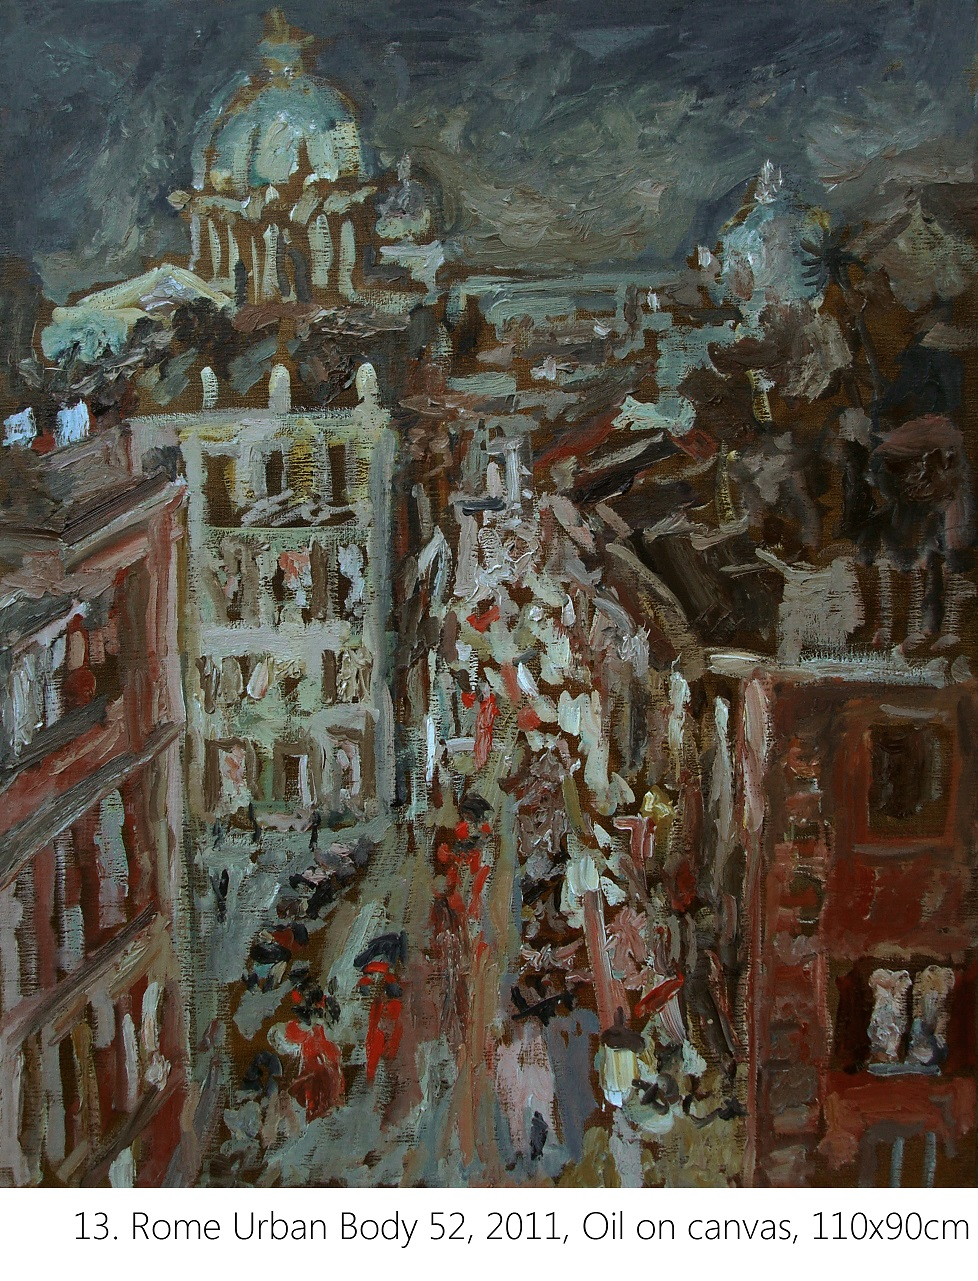 13. Rome Urban Body 52, 2011, Oil on canvas, 110x90cm